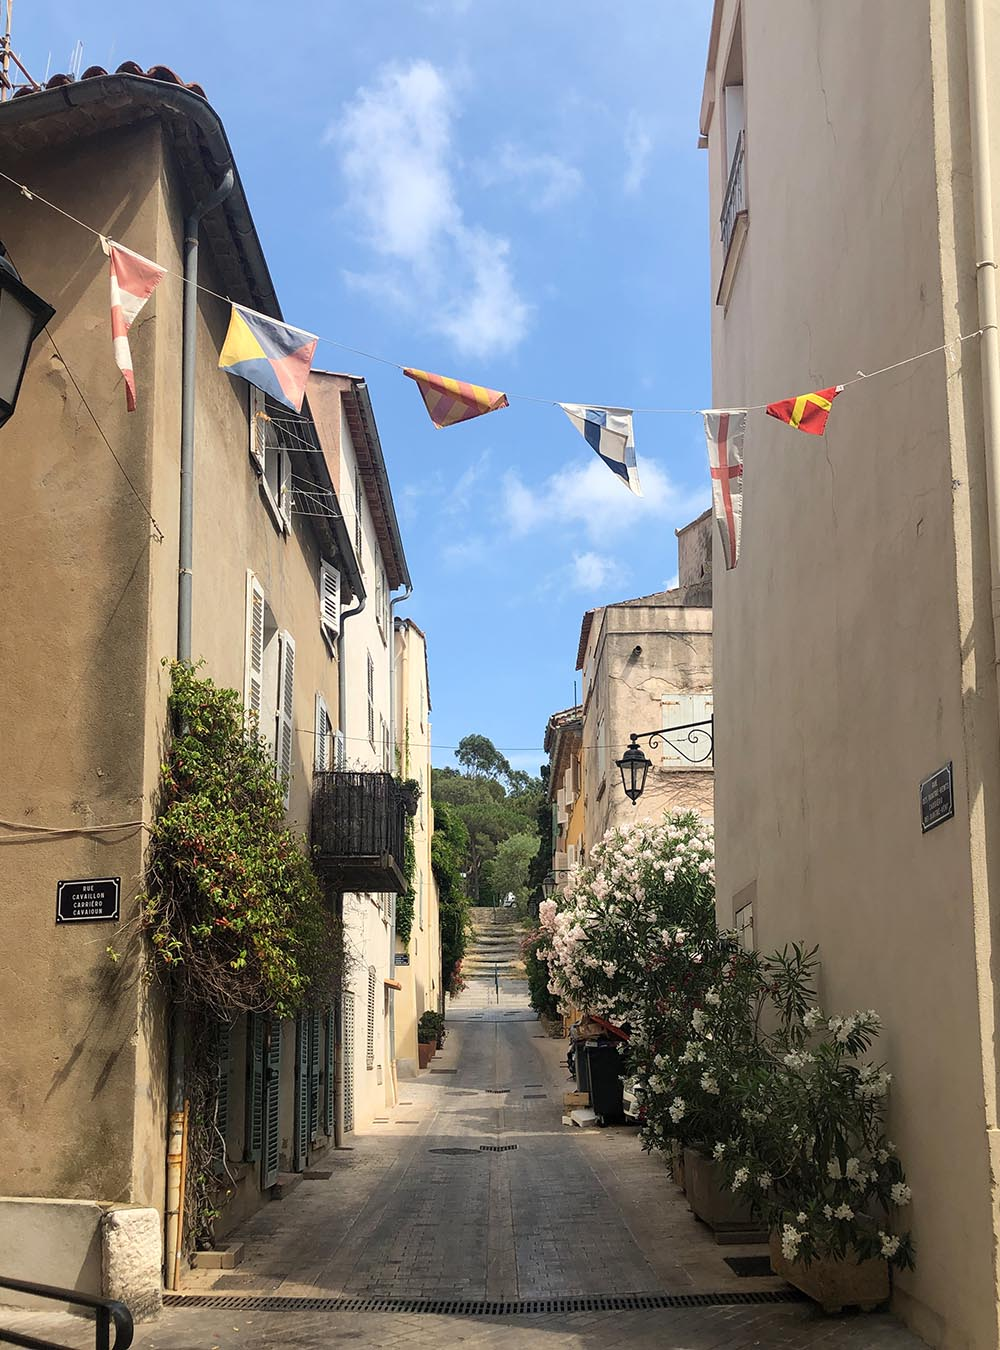 Sommer an der Côte d'Azur - Saint Tropez